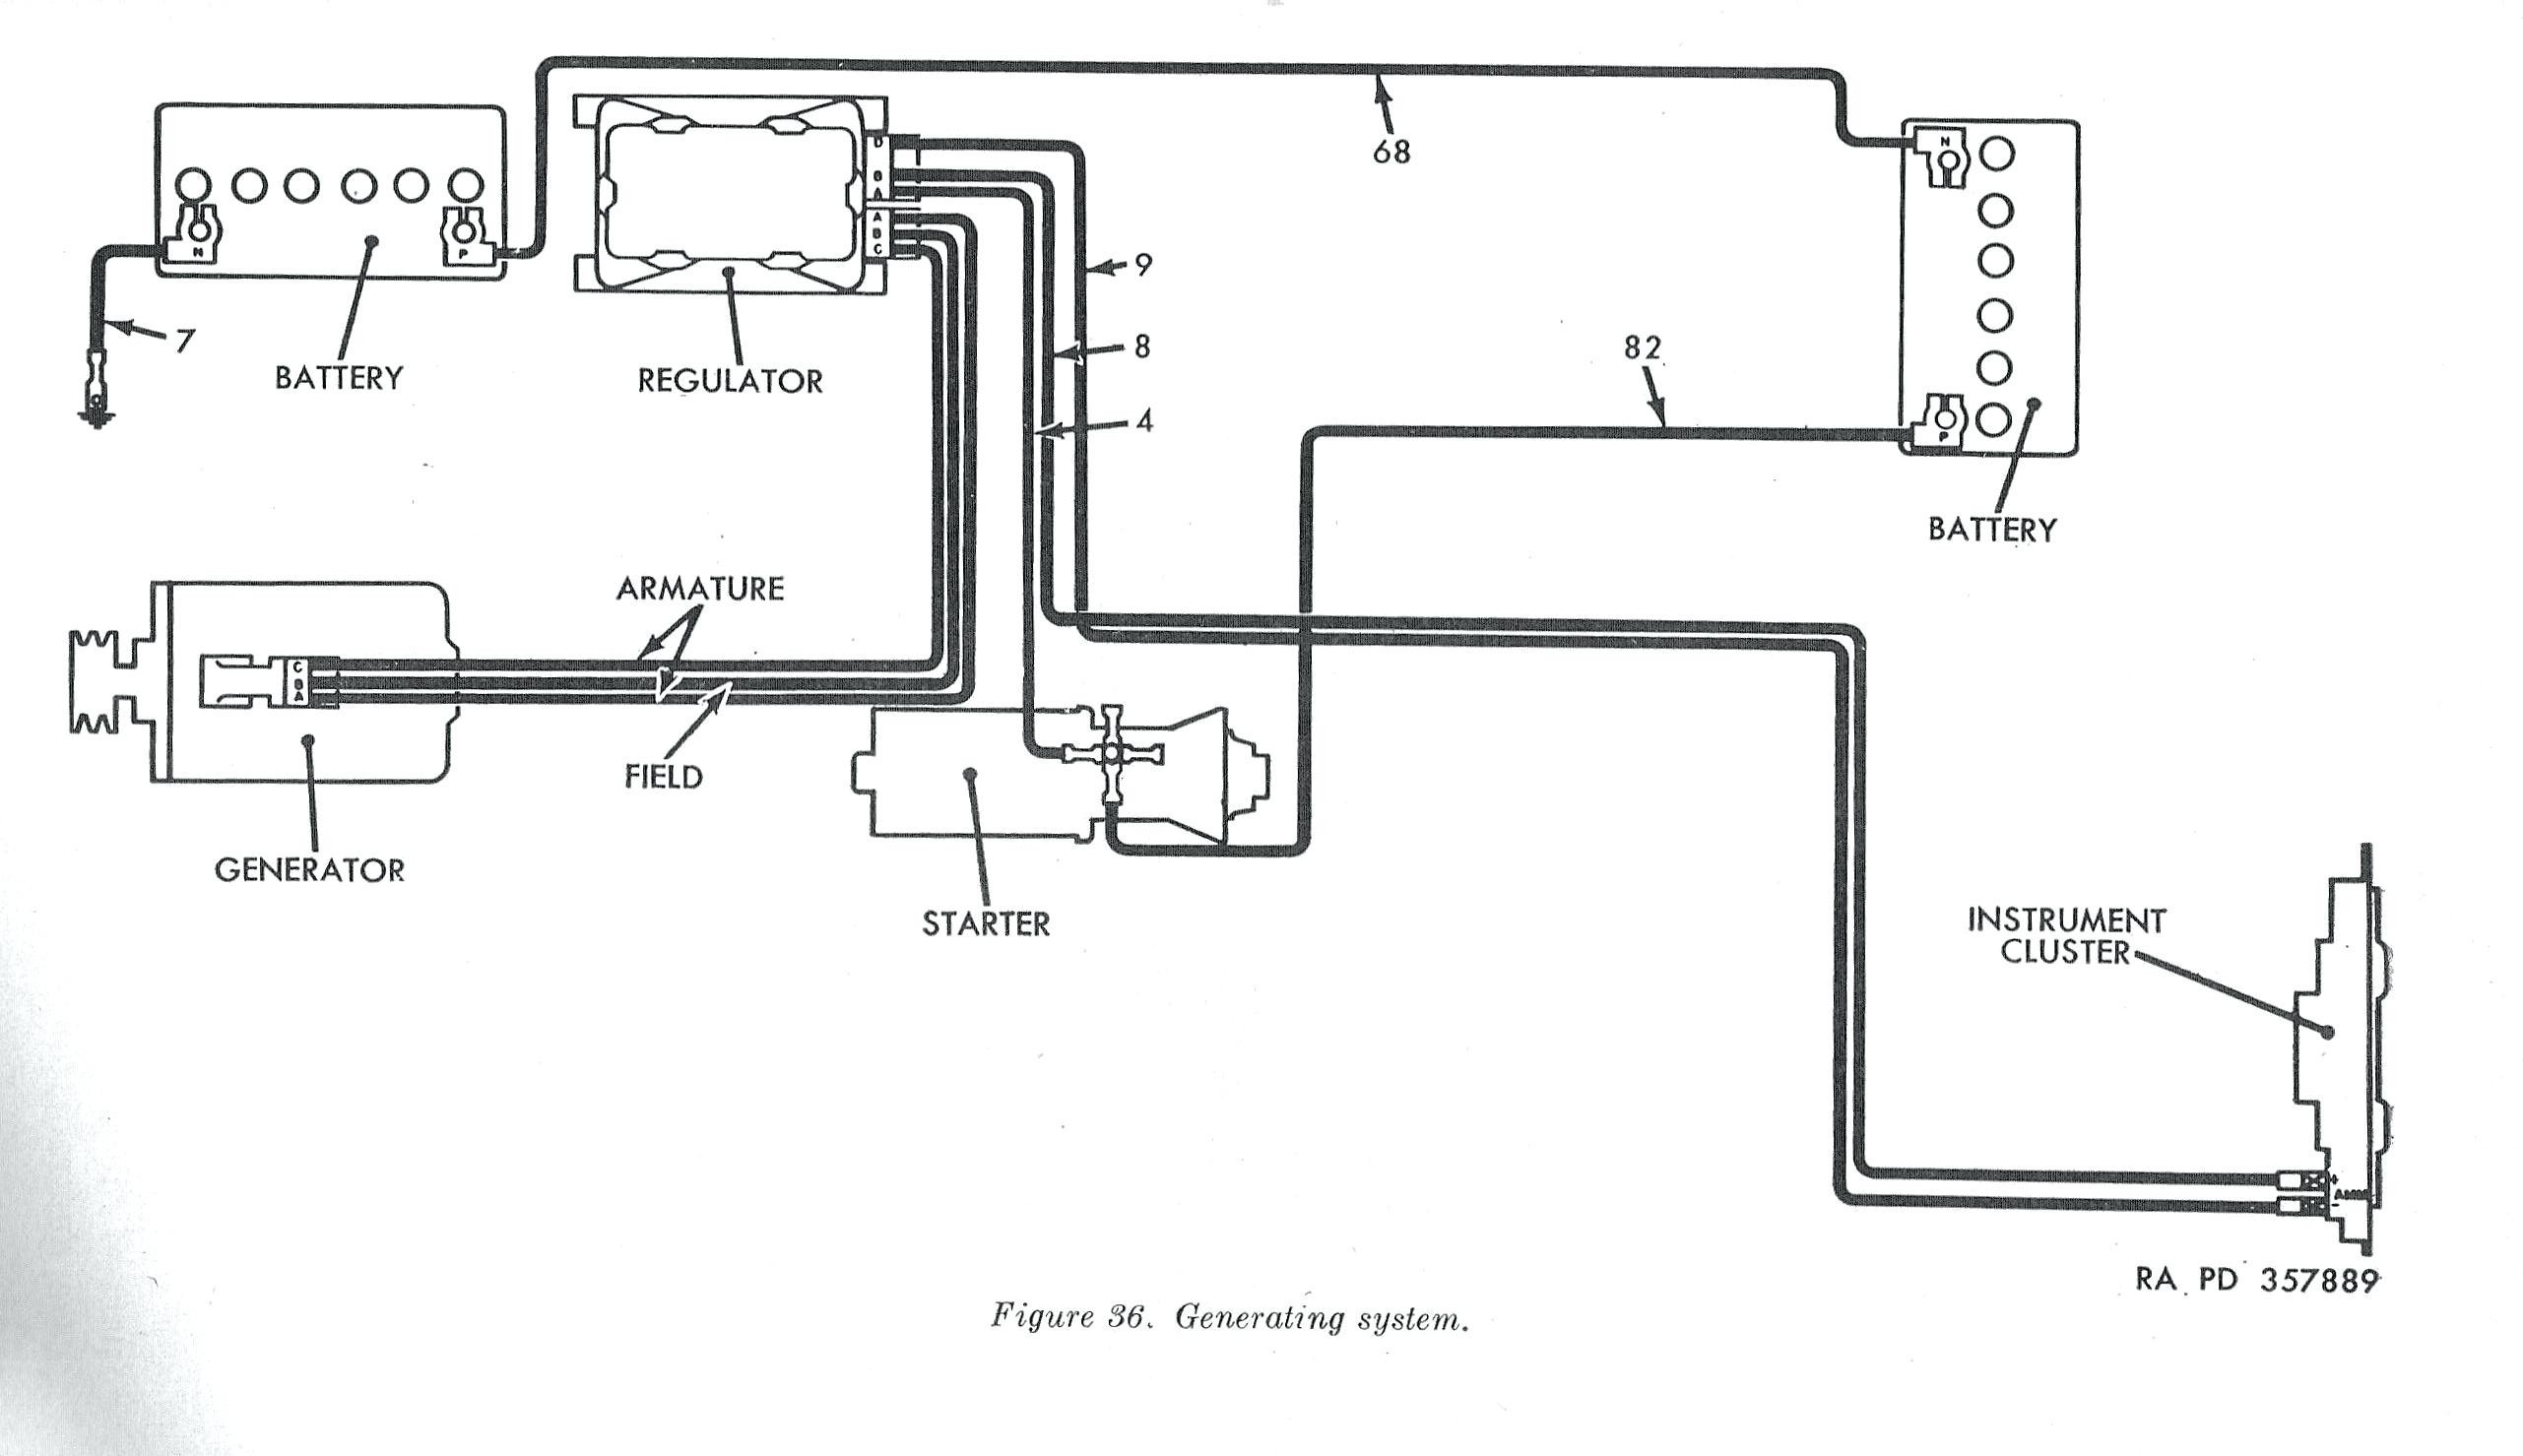 Manual Generator Transfer Switch Wiring Diagram Manual Transfer Switch Wiring Diagram Webtor Me Also Afif Of Manual Generator Transfer Switch Wiring Diagram